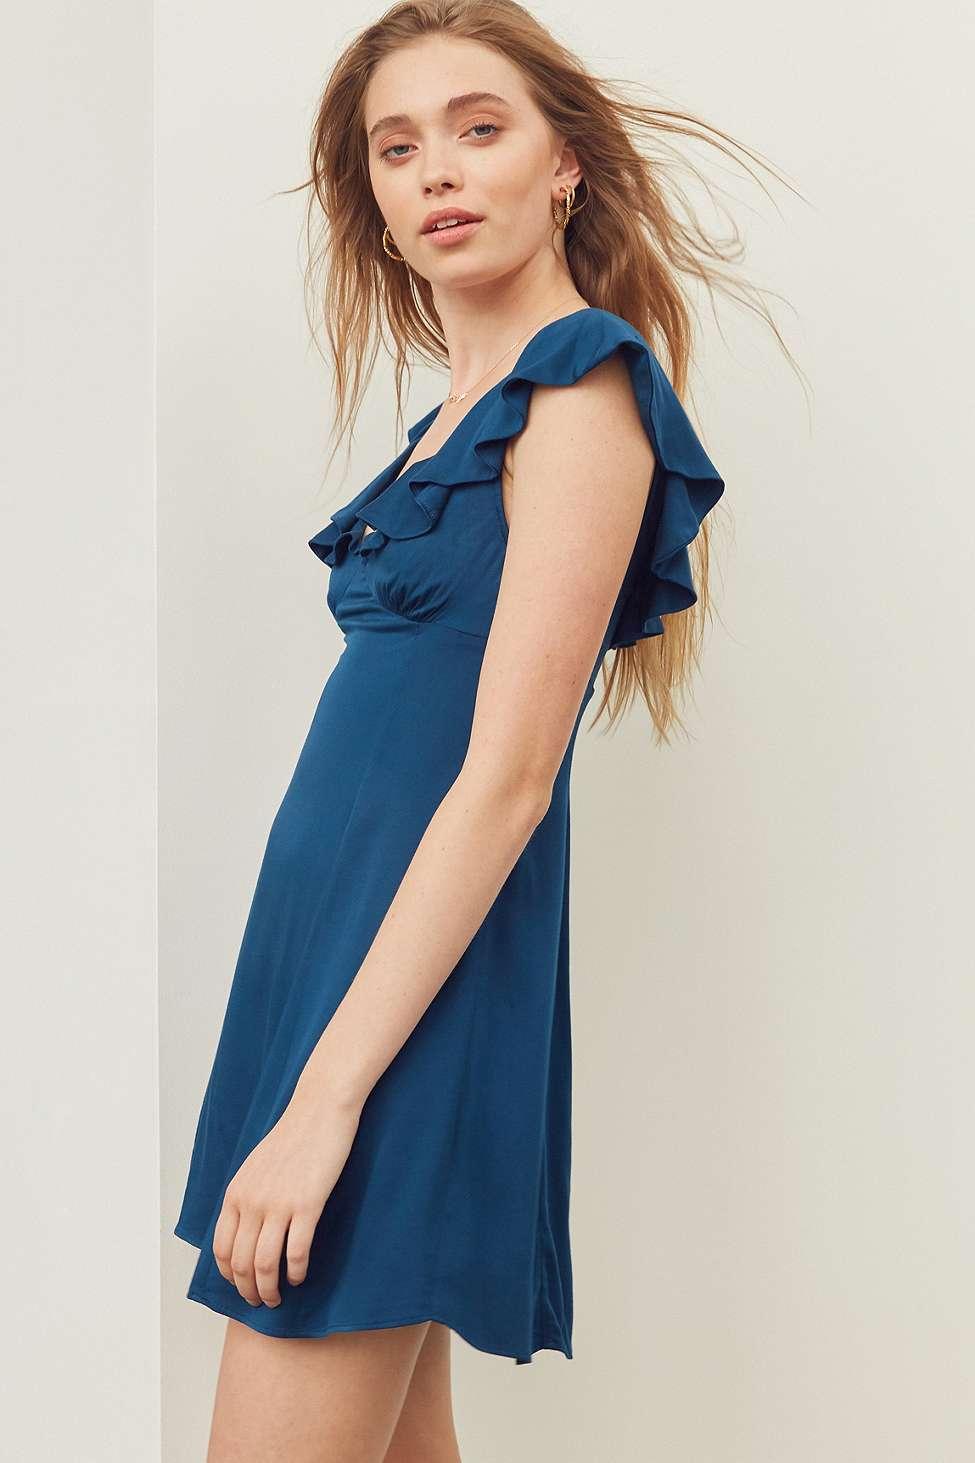 Kimchi Blue Daisy May Blue Ruffle Dress | Urban Outfitters